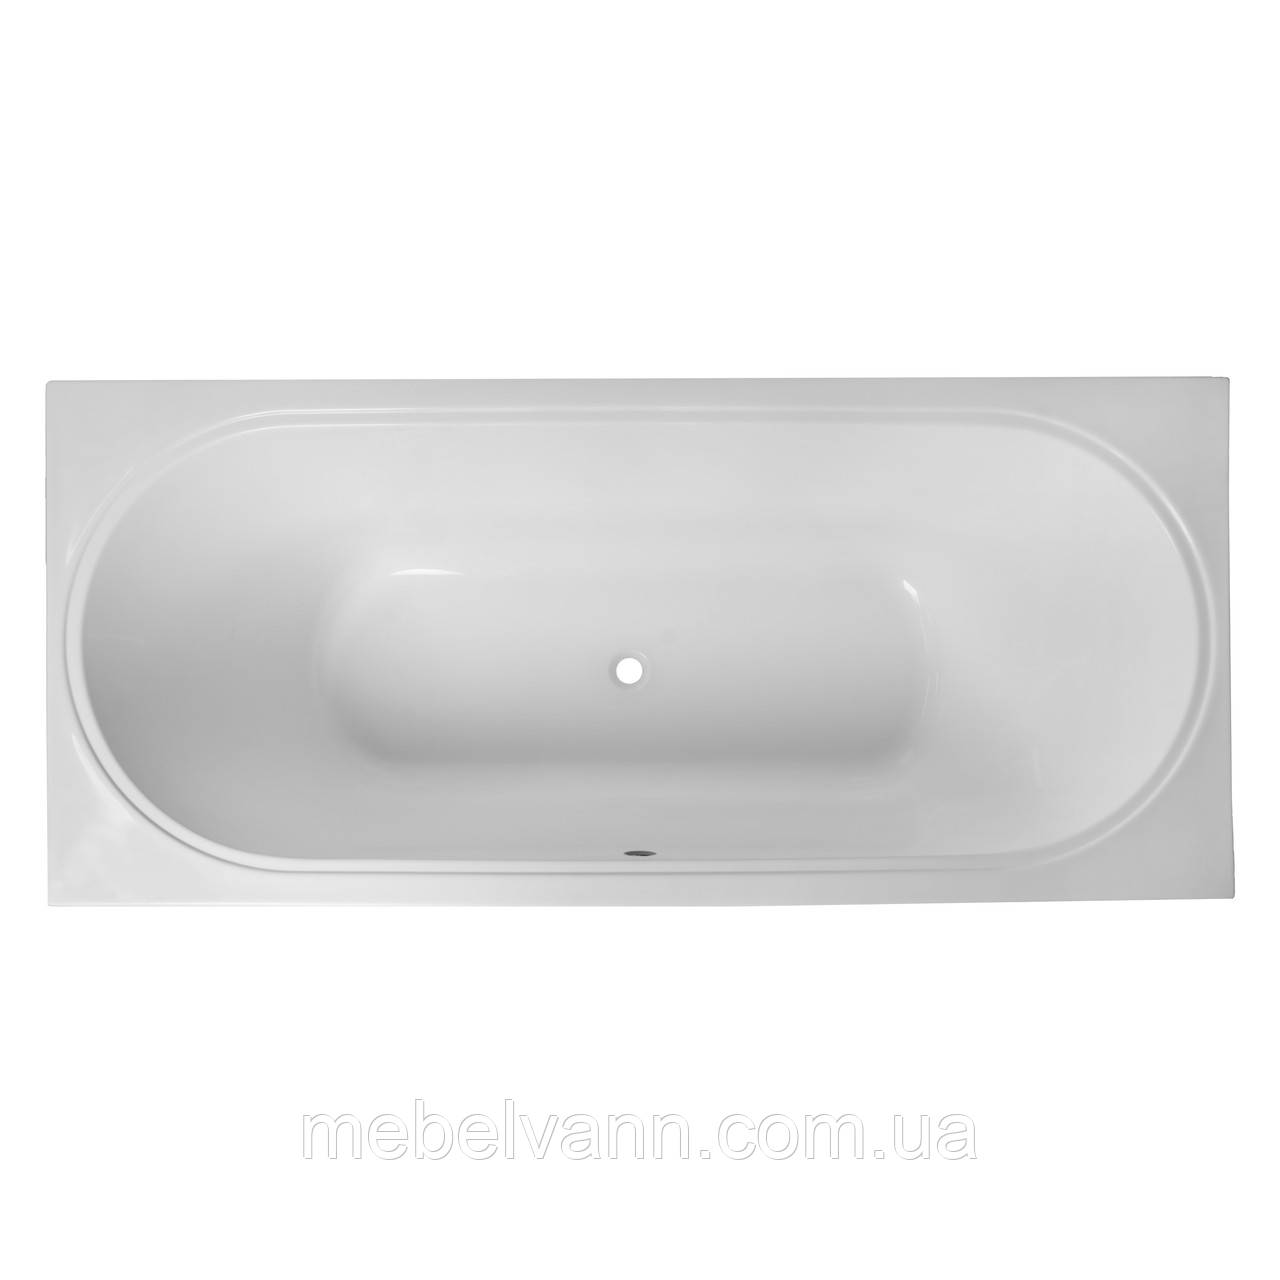 Ванна акриловая Volle Oliva 180*80 TS-1880500